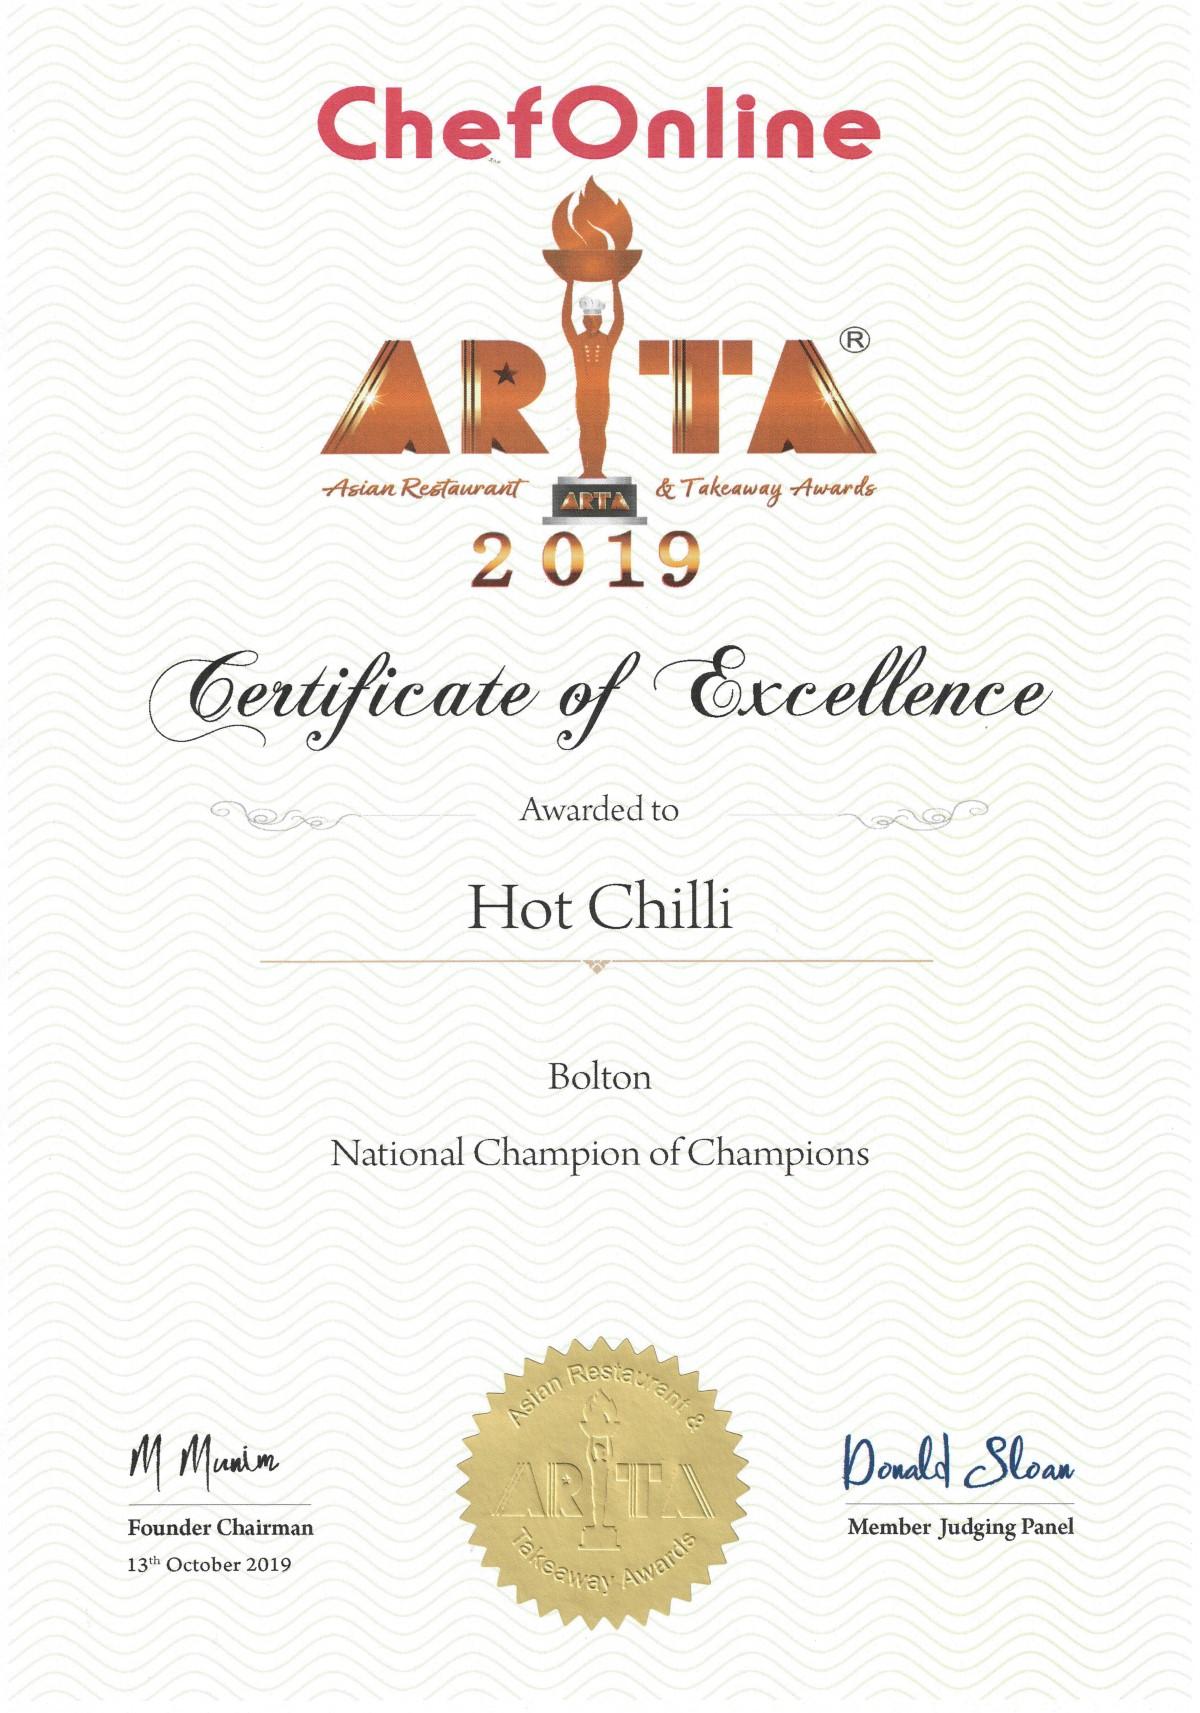 Champion of Champions Winner Certificate